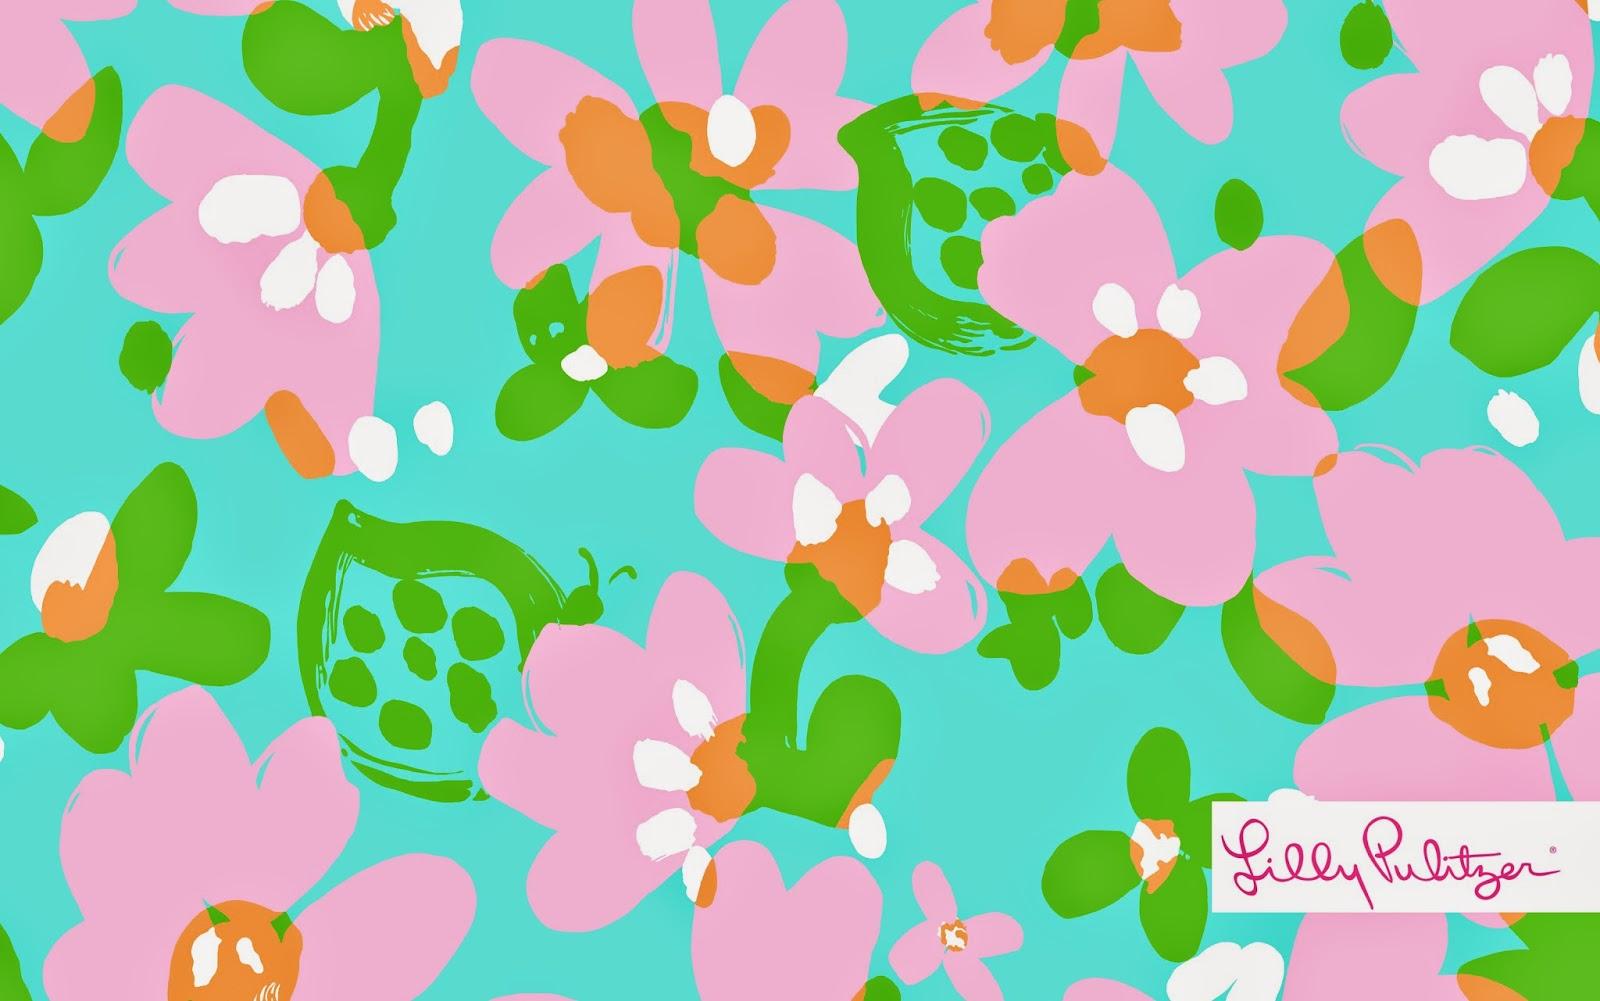 CanadianPrep: Lilly Desktop Wallpaper.